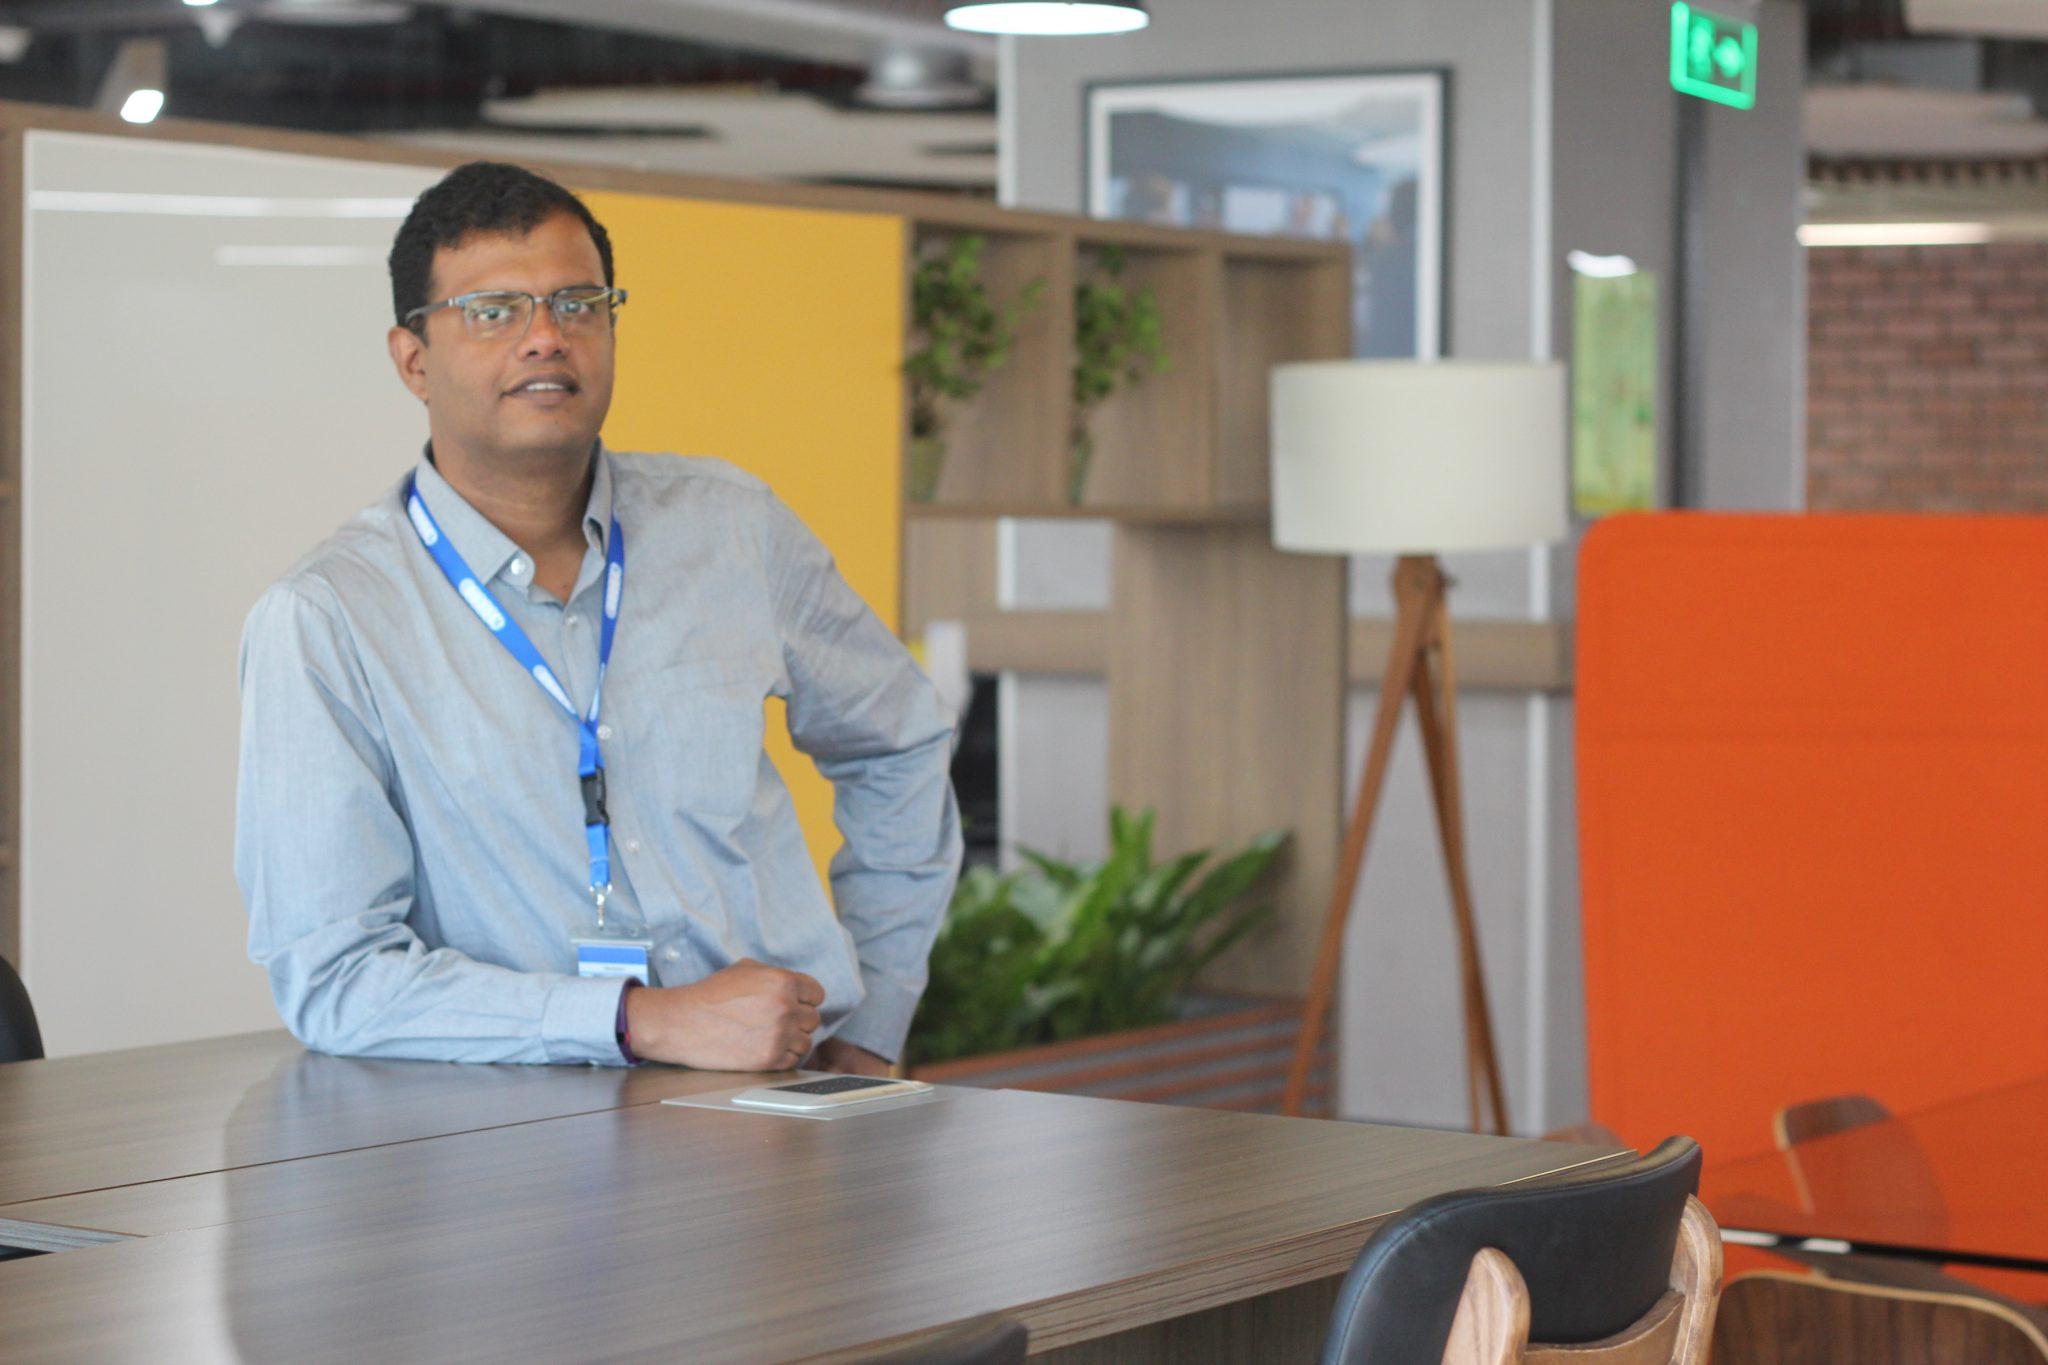 GE Digital: Driving the next industrial revolution through Analytics